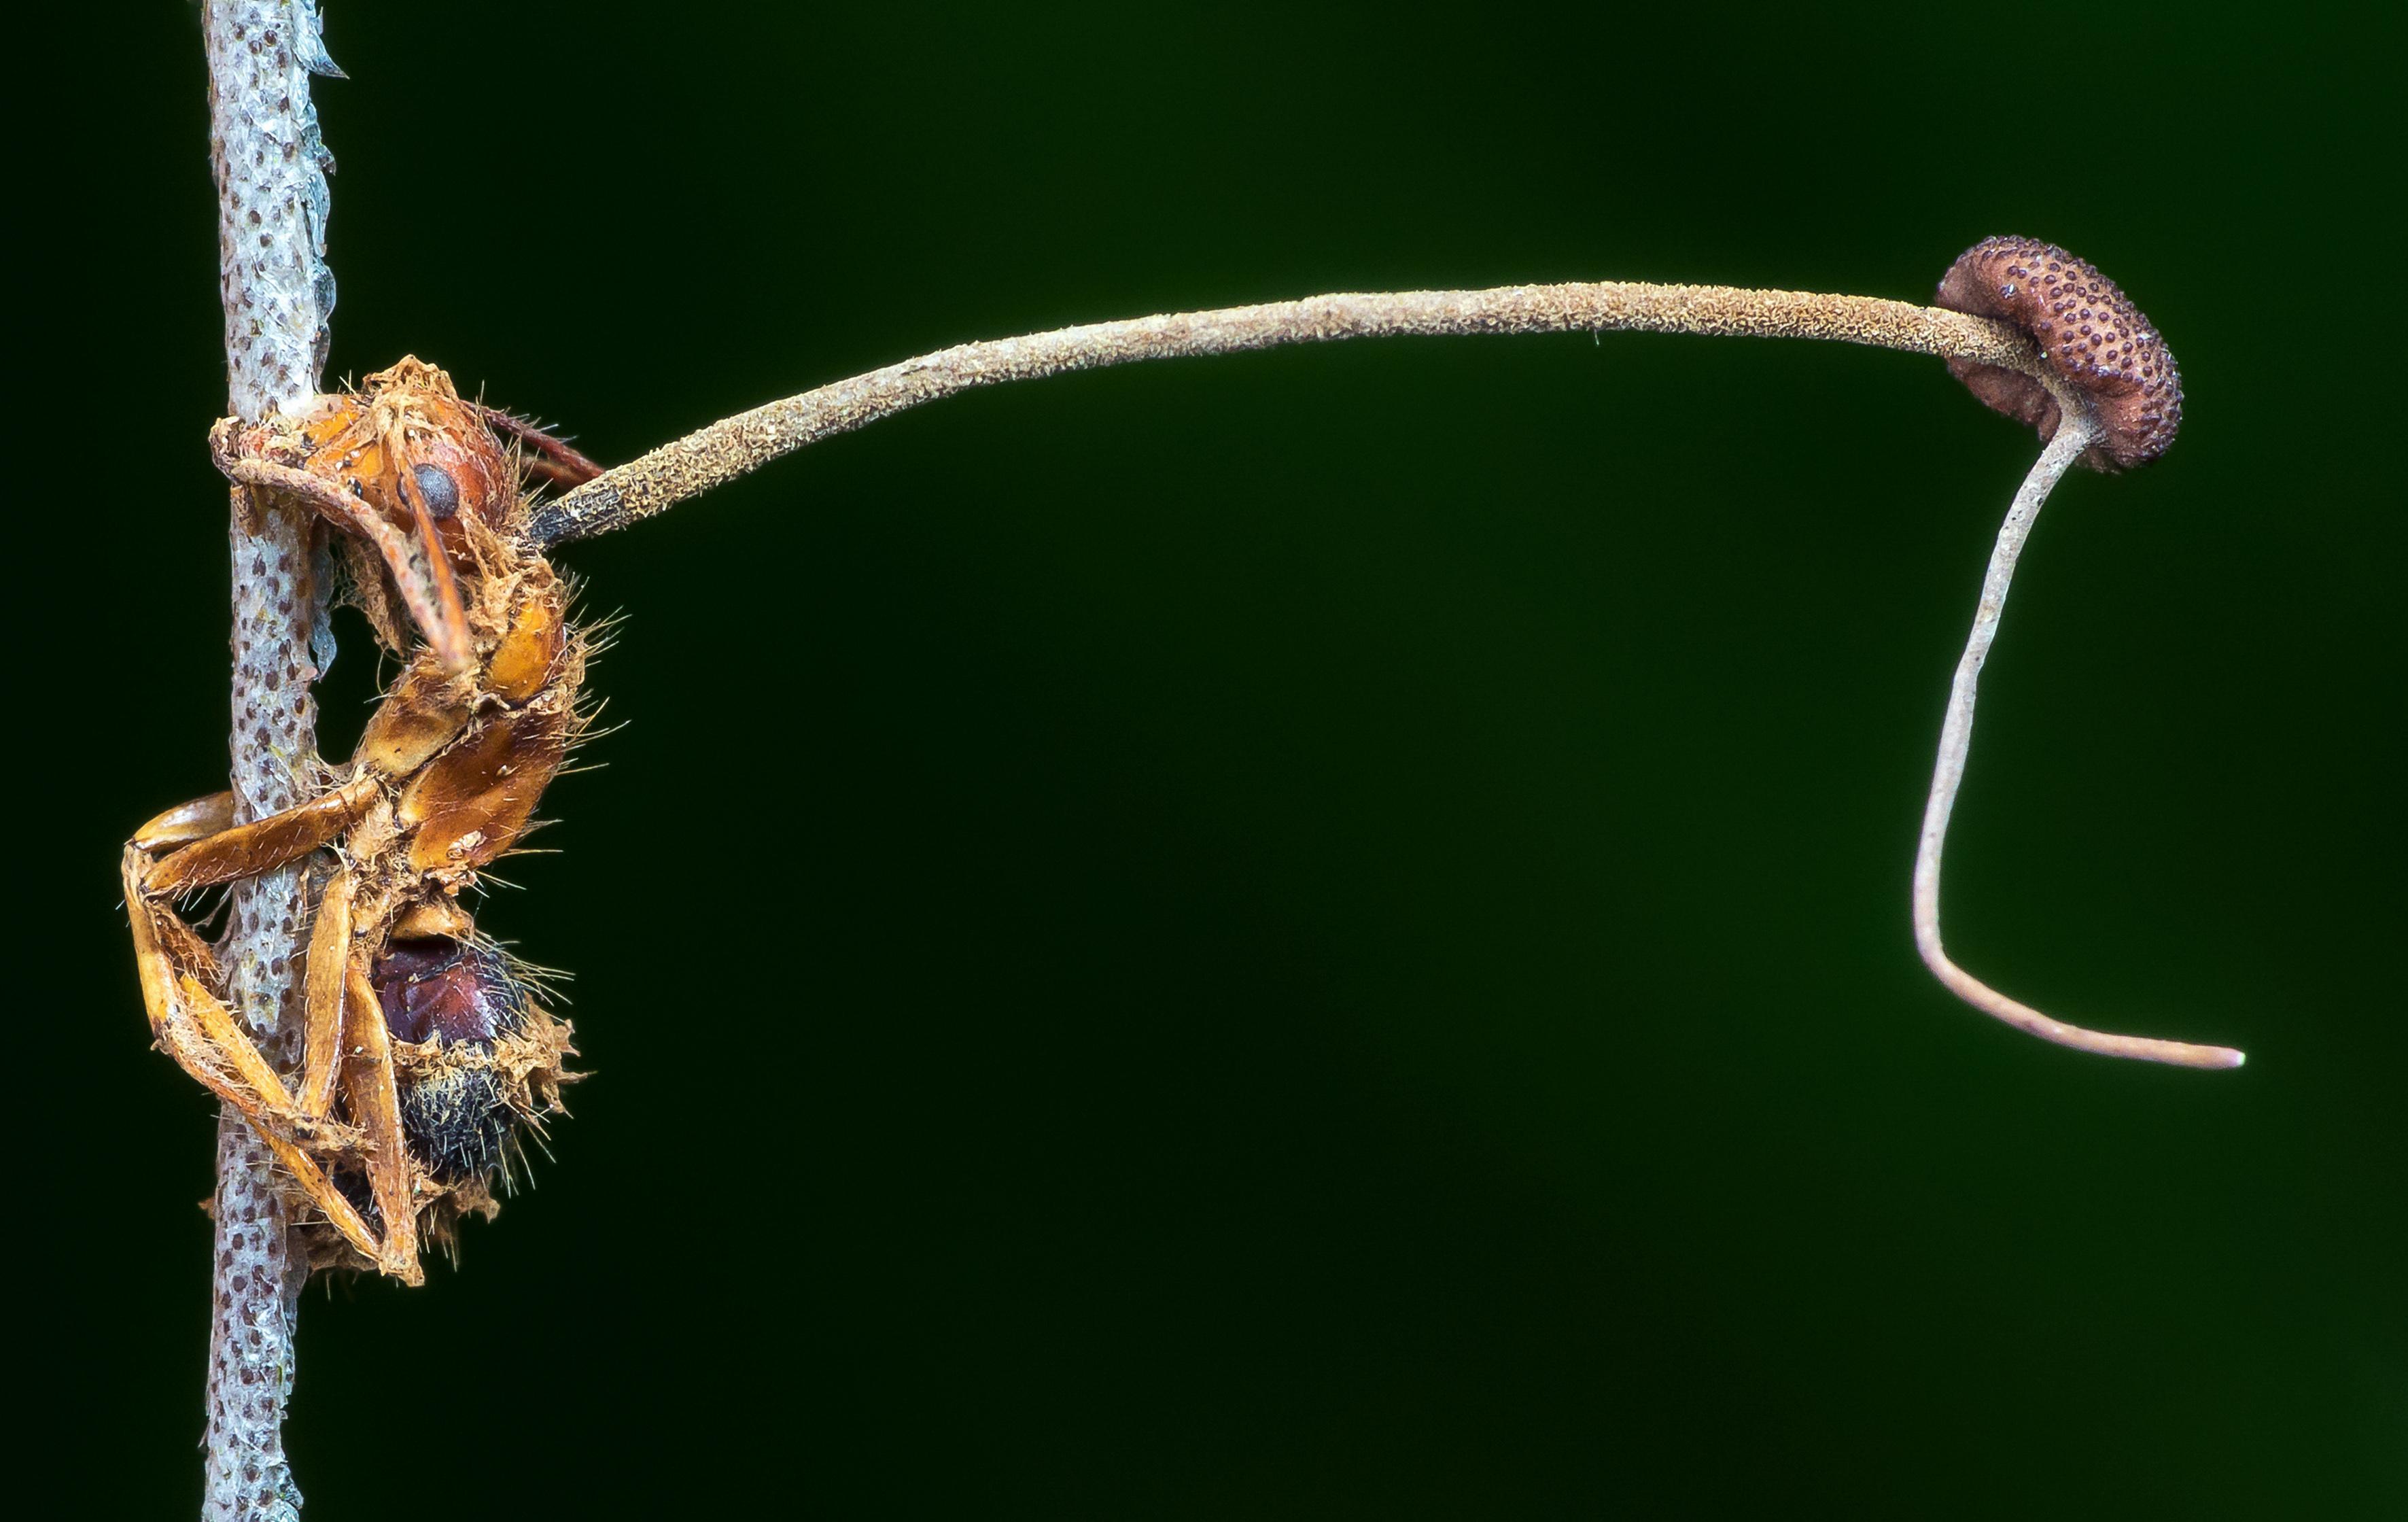 В балтийском янтаре обнаружили паразитирующий на муравьях гриб